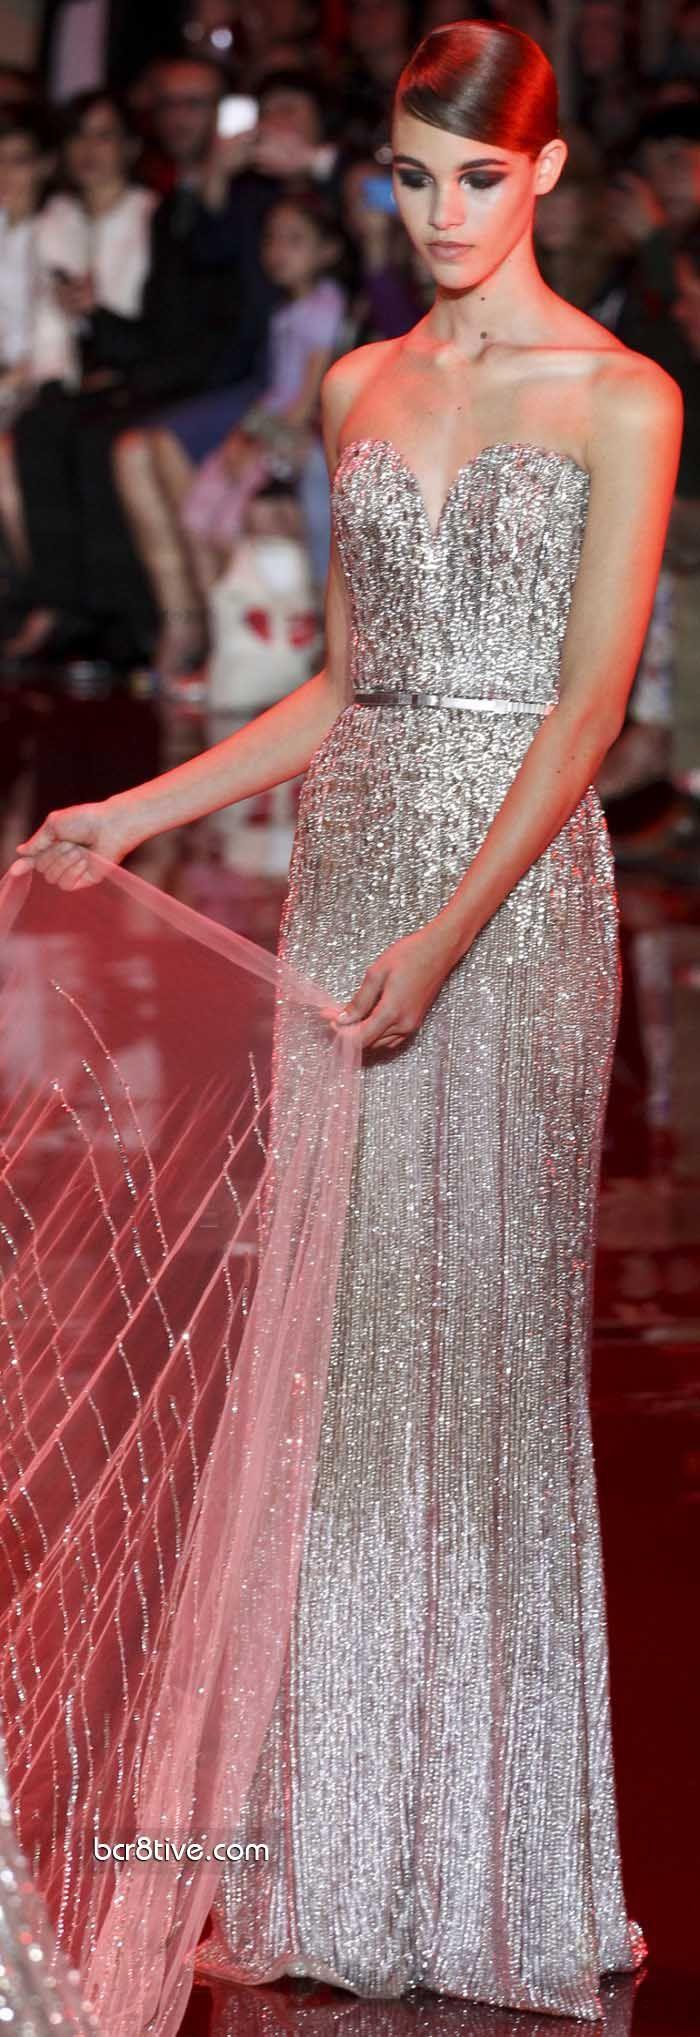 Elie Saab FW 2014 Haute Couture - Incredible Bridesmaids Dress. <3 jaglady #HauteCouture